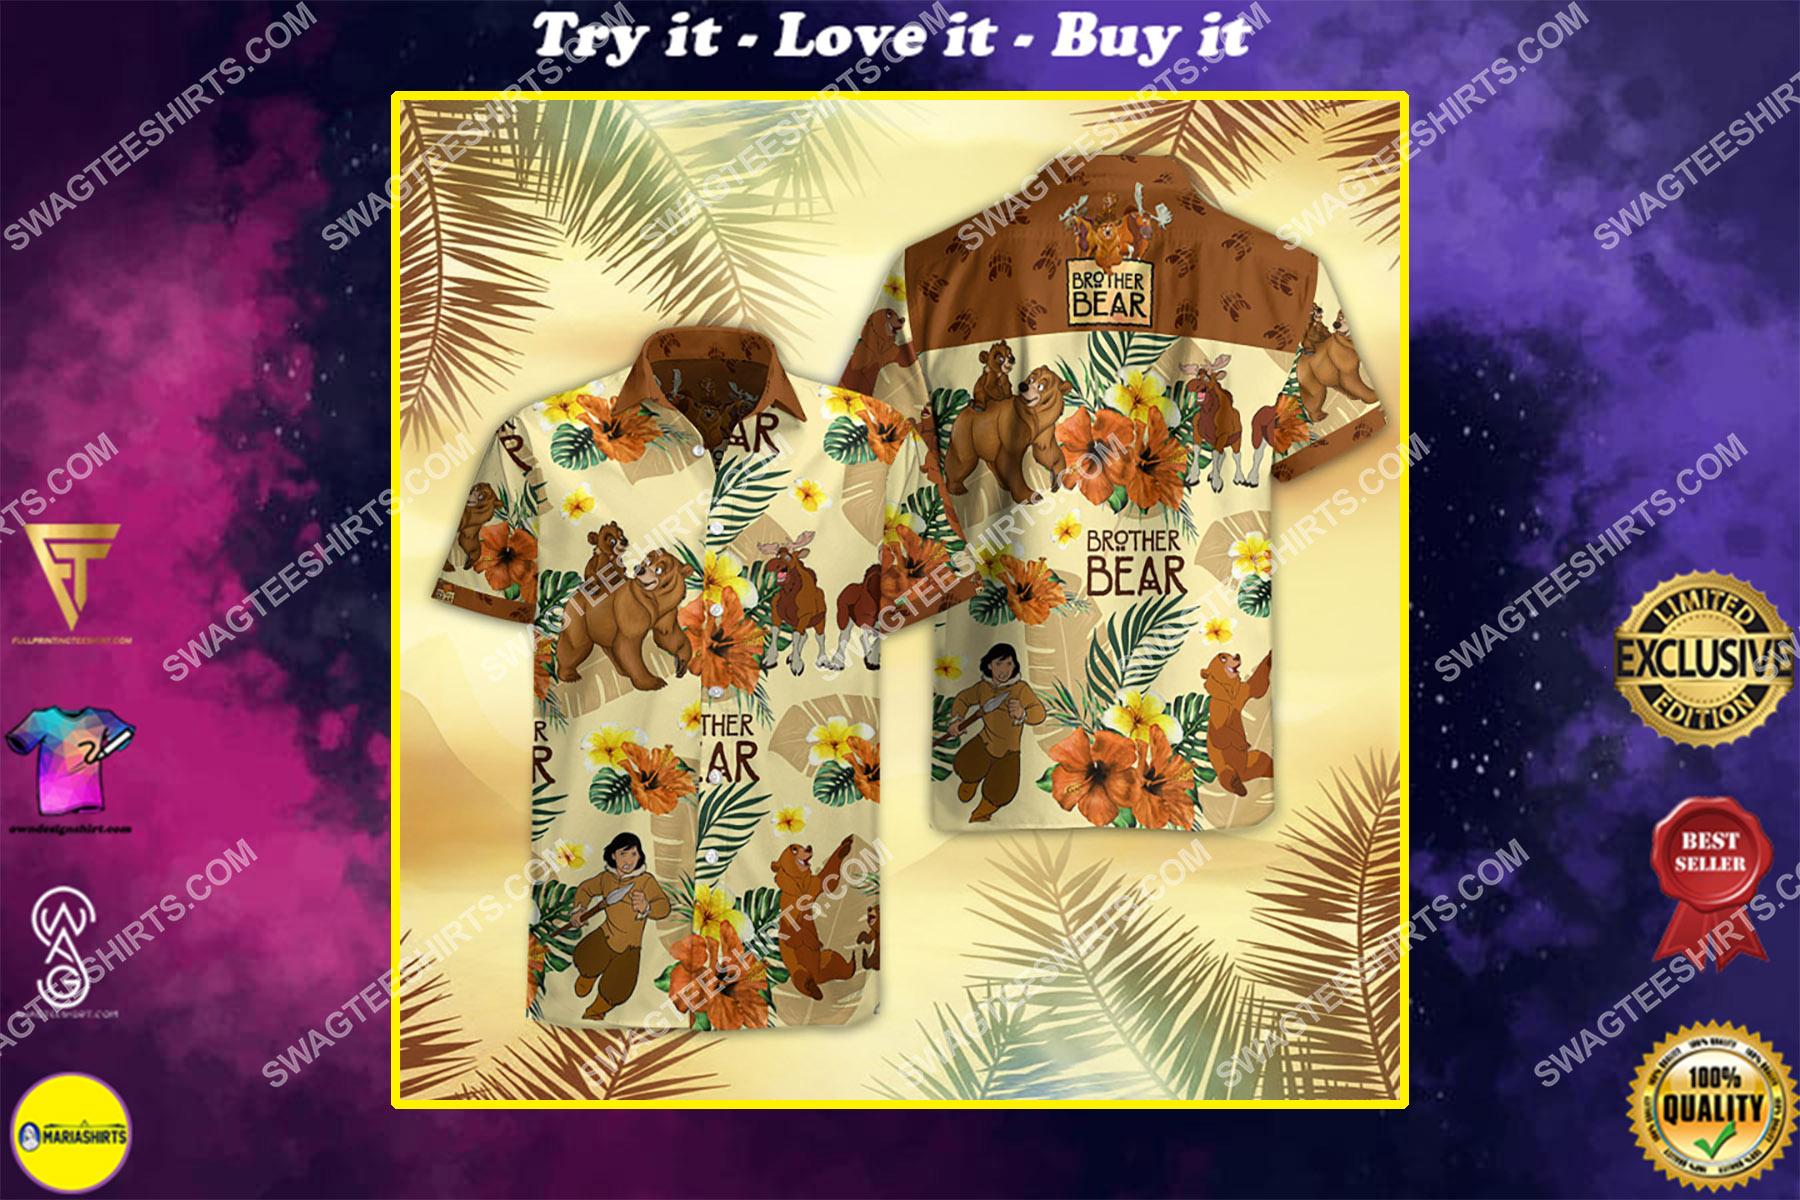 brother bear movie all over print hawaiian shirt